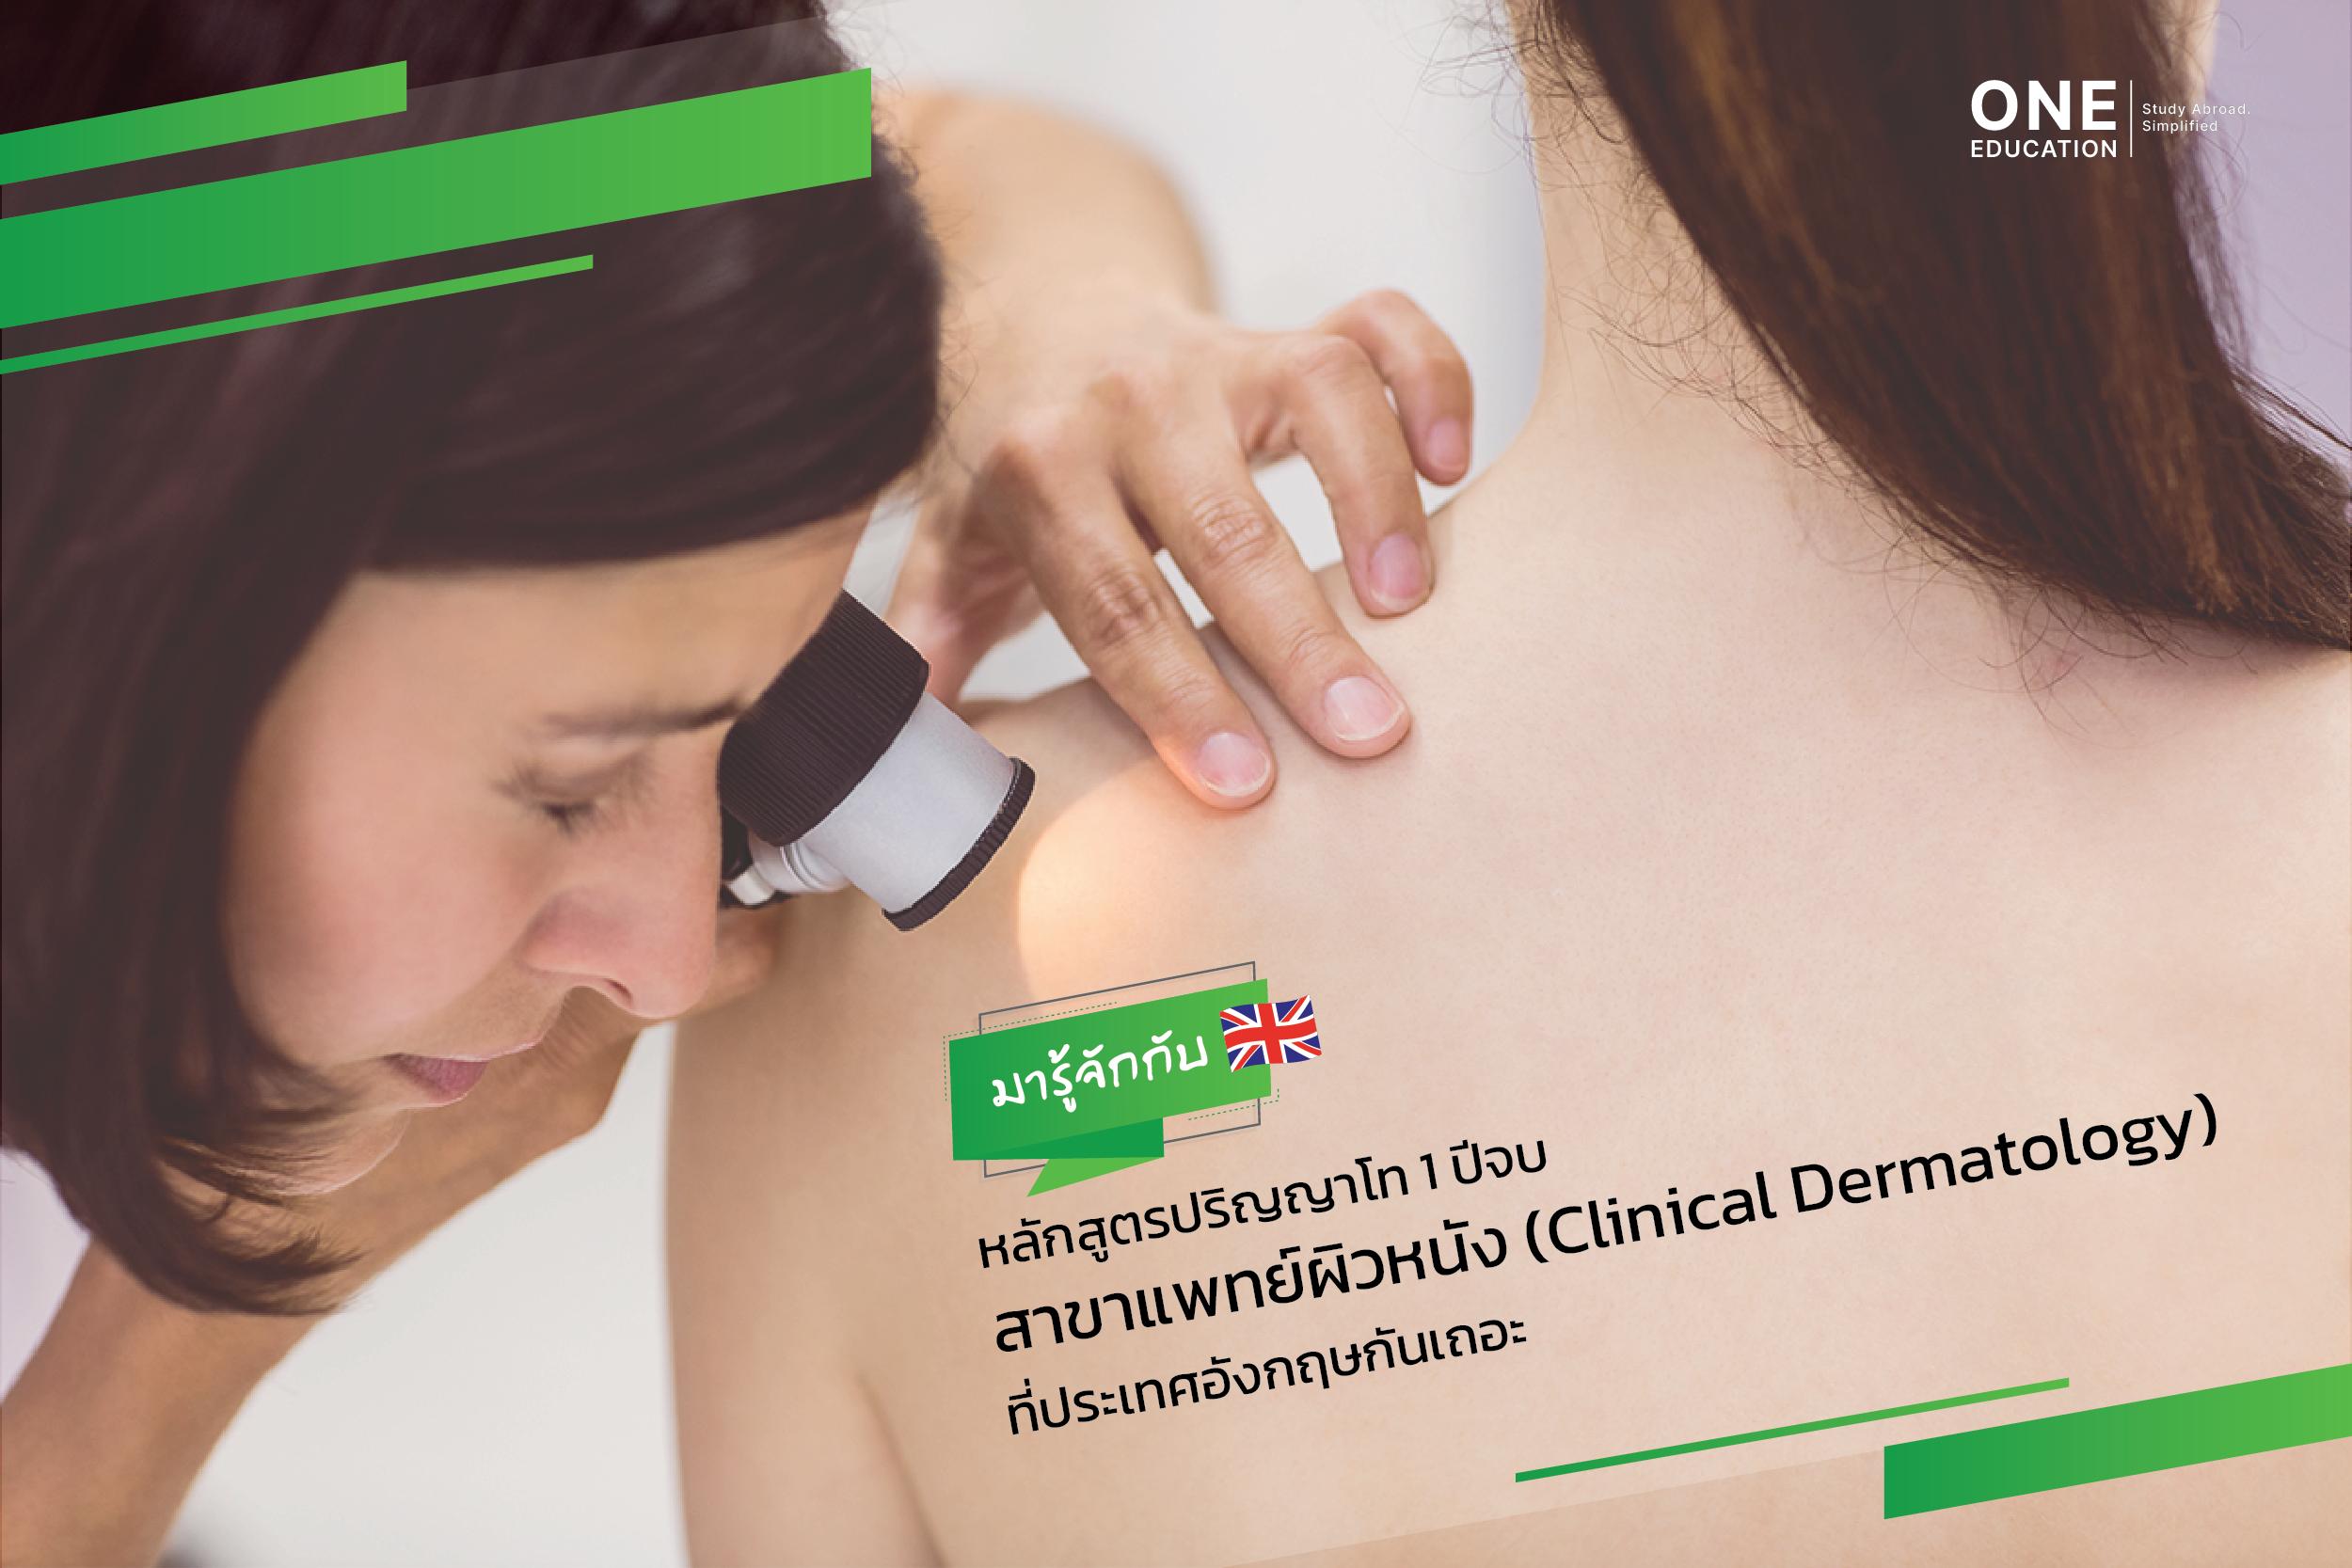 Clinical Dermatology ที่อังกฤษ